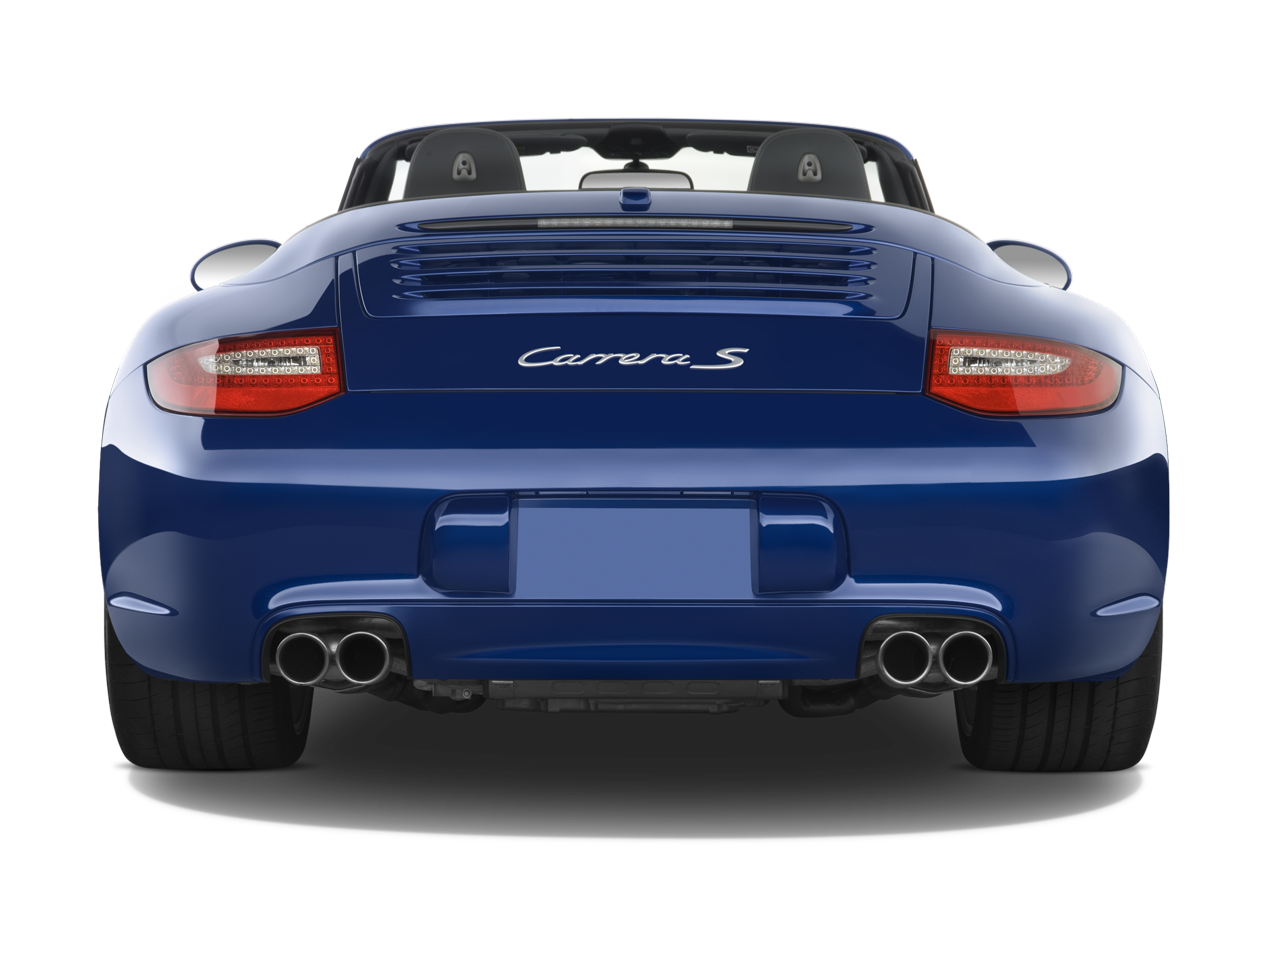 2009 Porsche 911 Carrera 4 And Carrera 4s